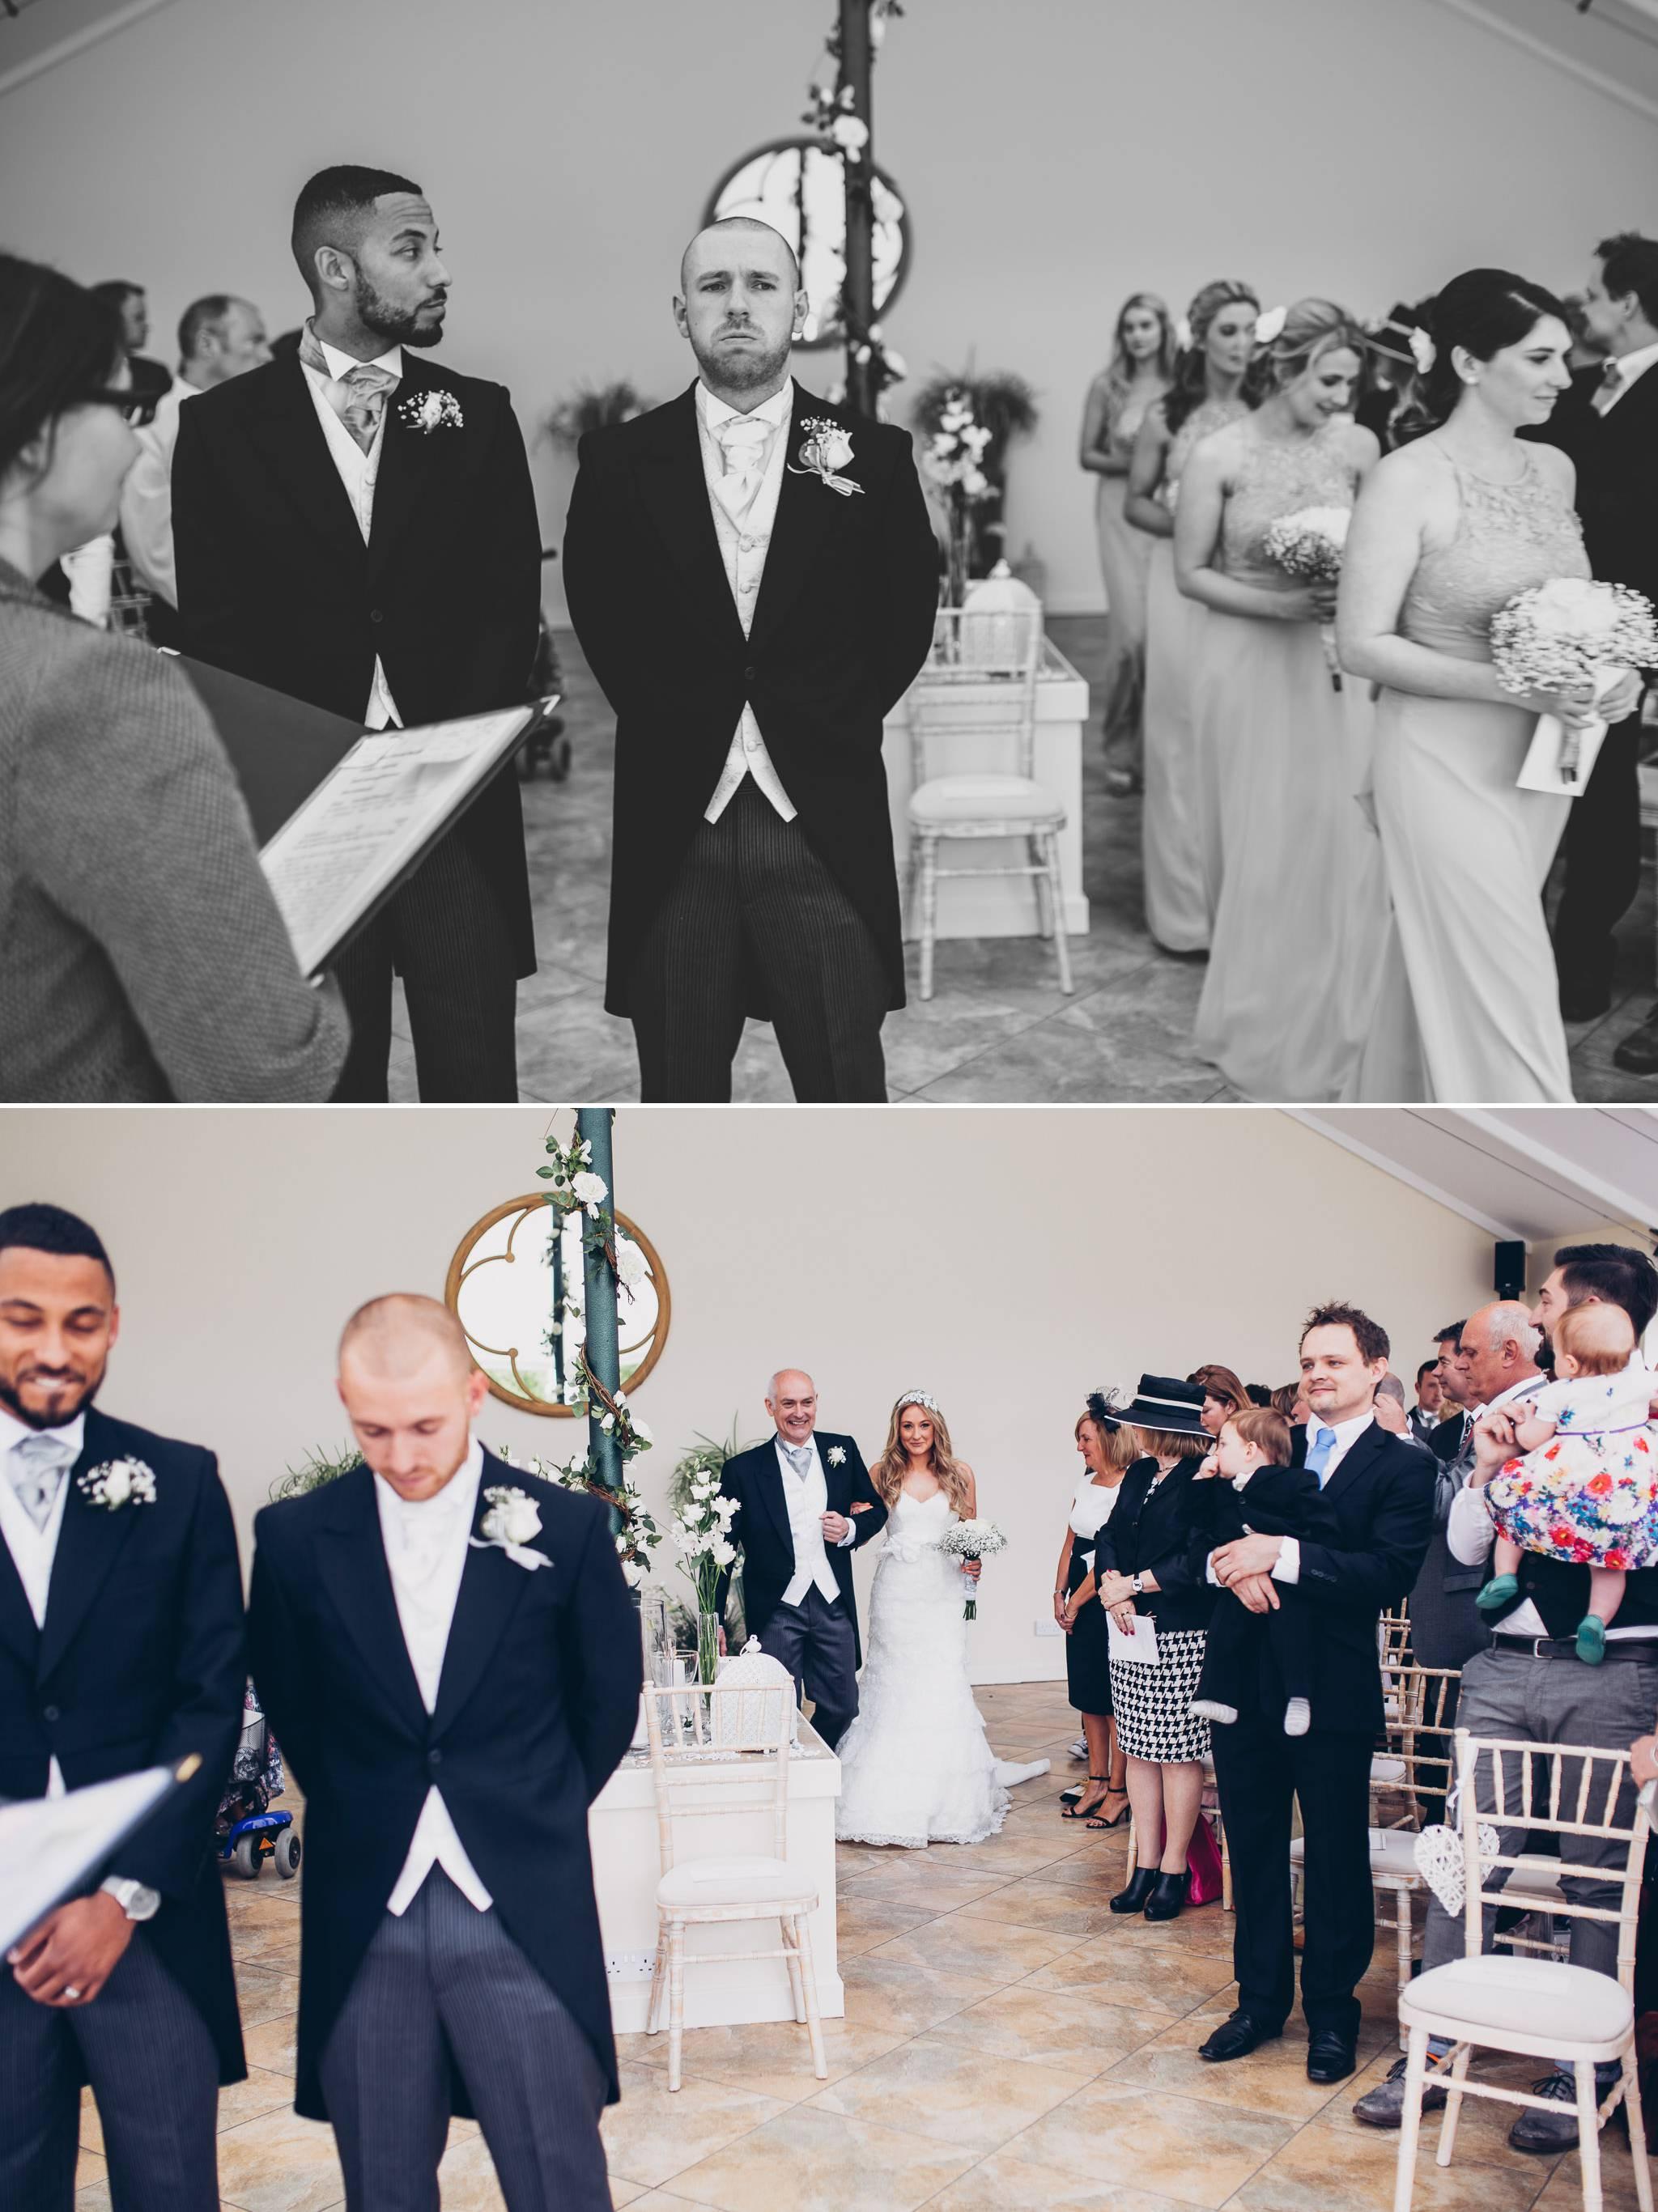 shropshire-wedding-photography 9.jpg